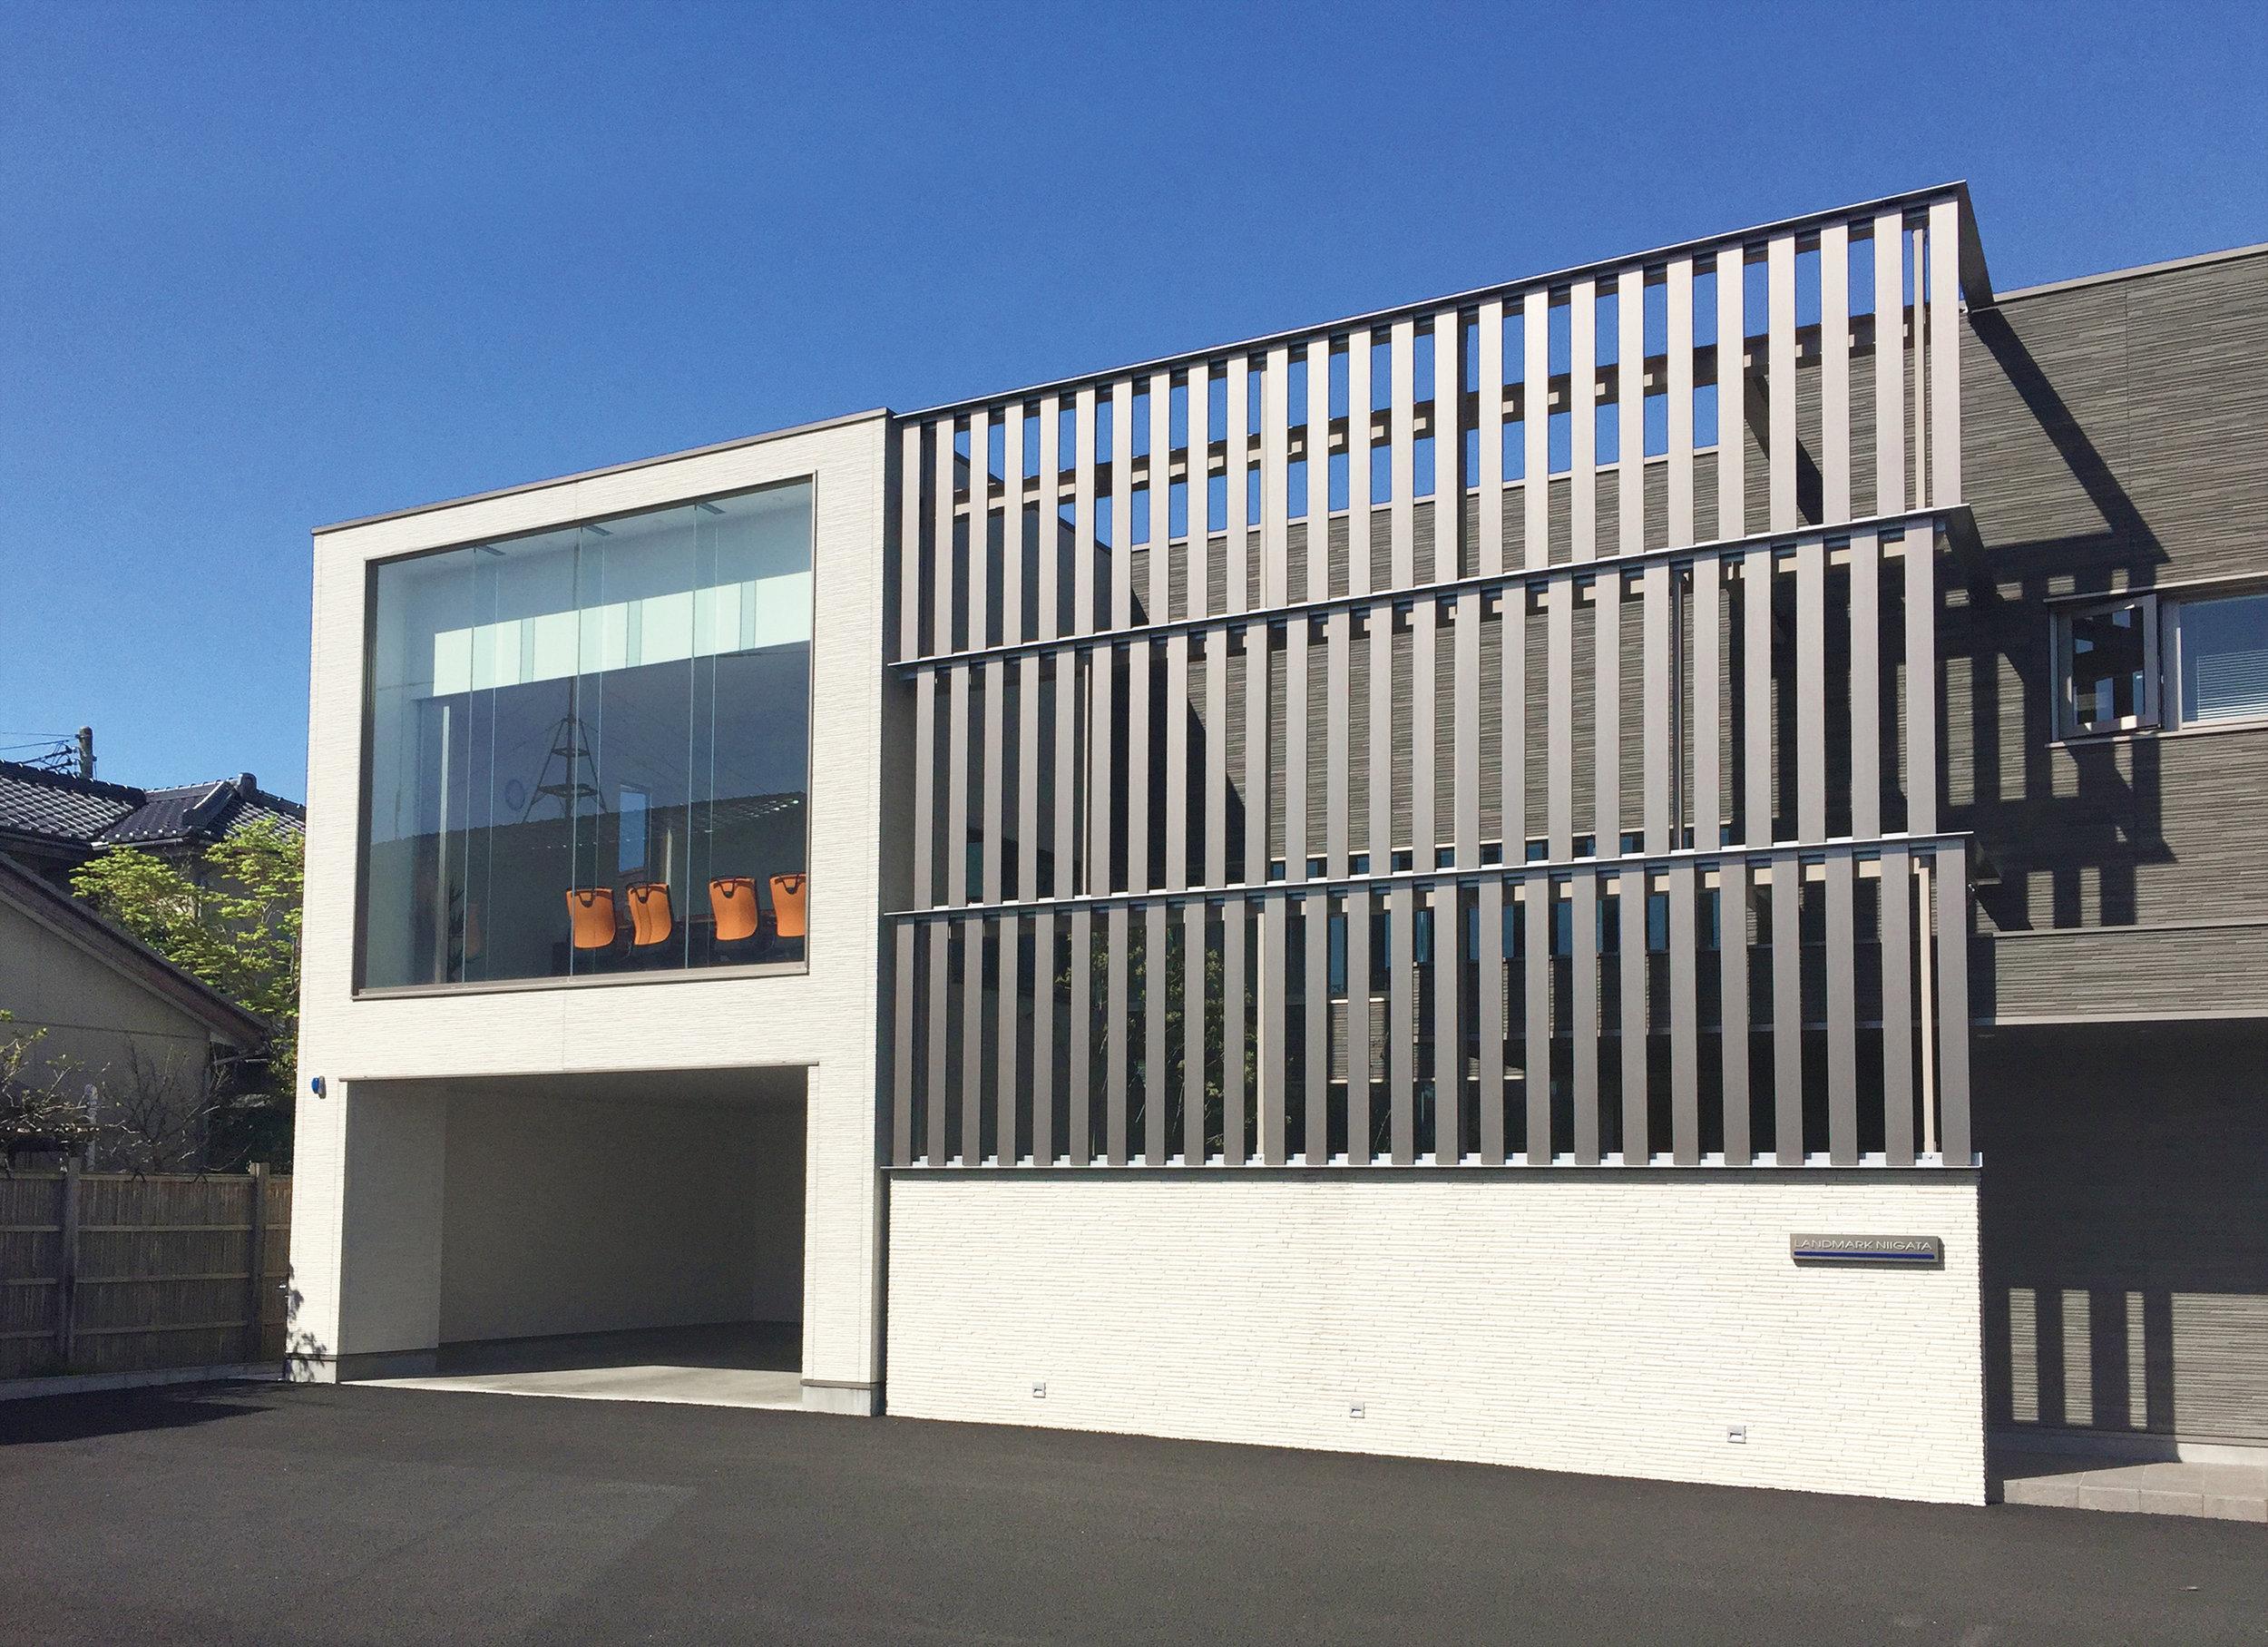 Commercial Office Facade - Japan Ever Art Wood® battens - Koshi Plank 20x150mm in Gan Metaru